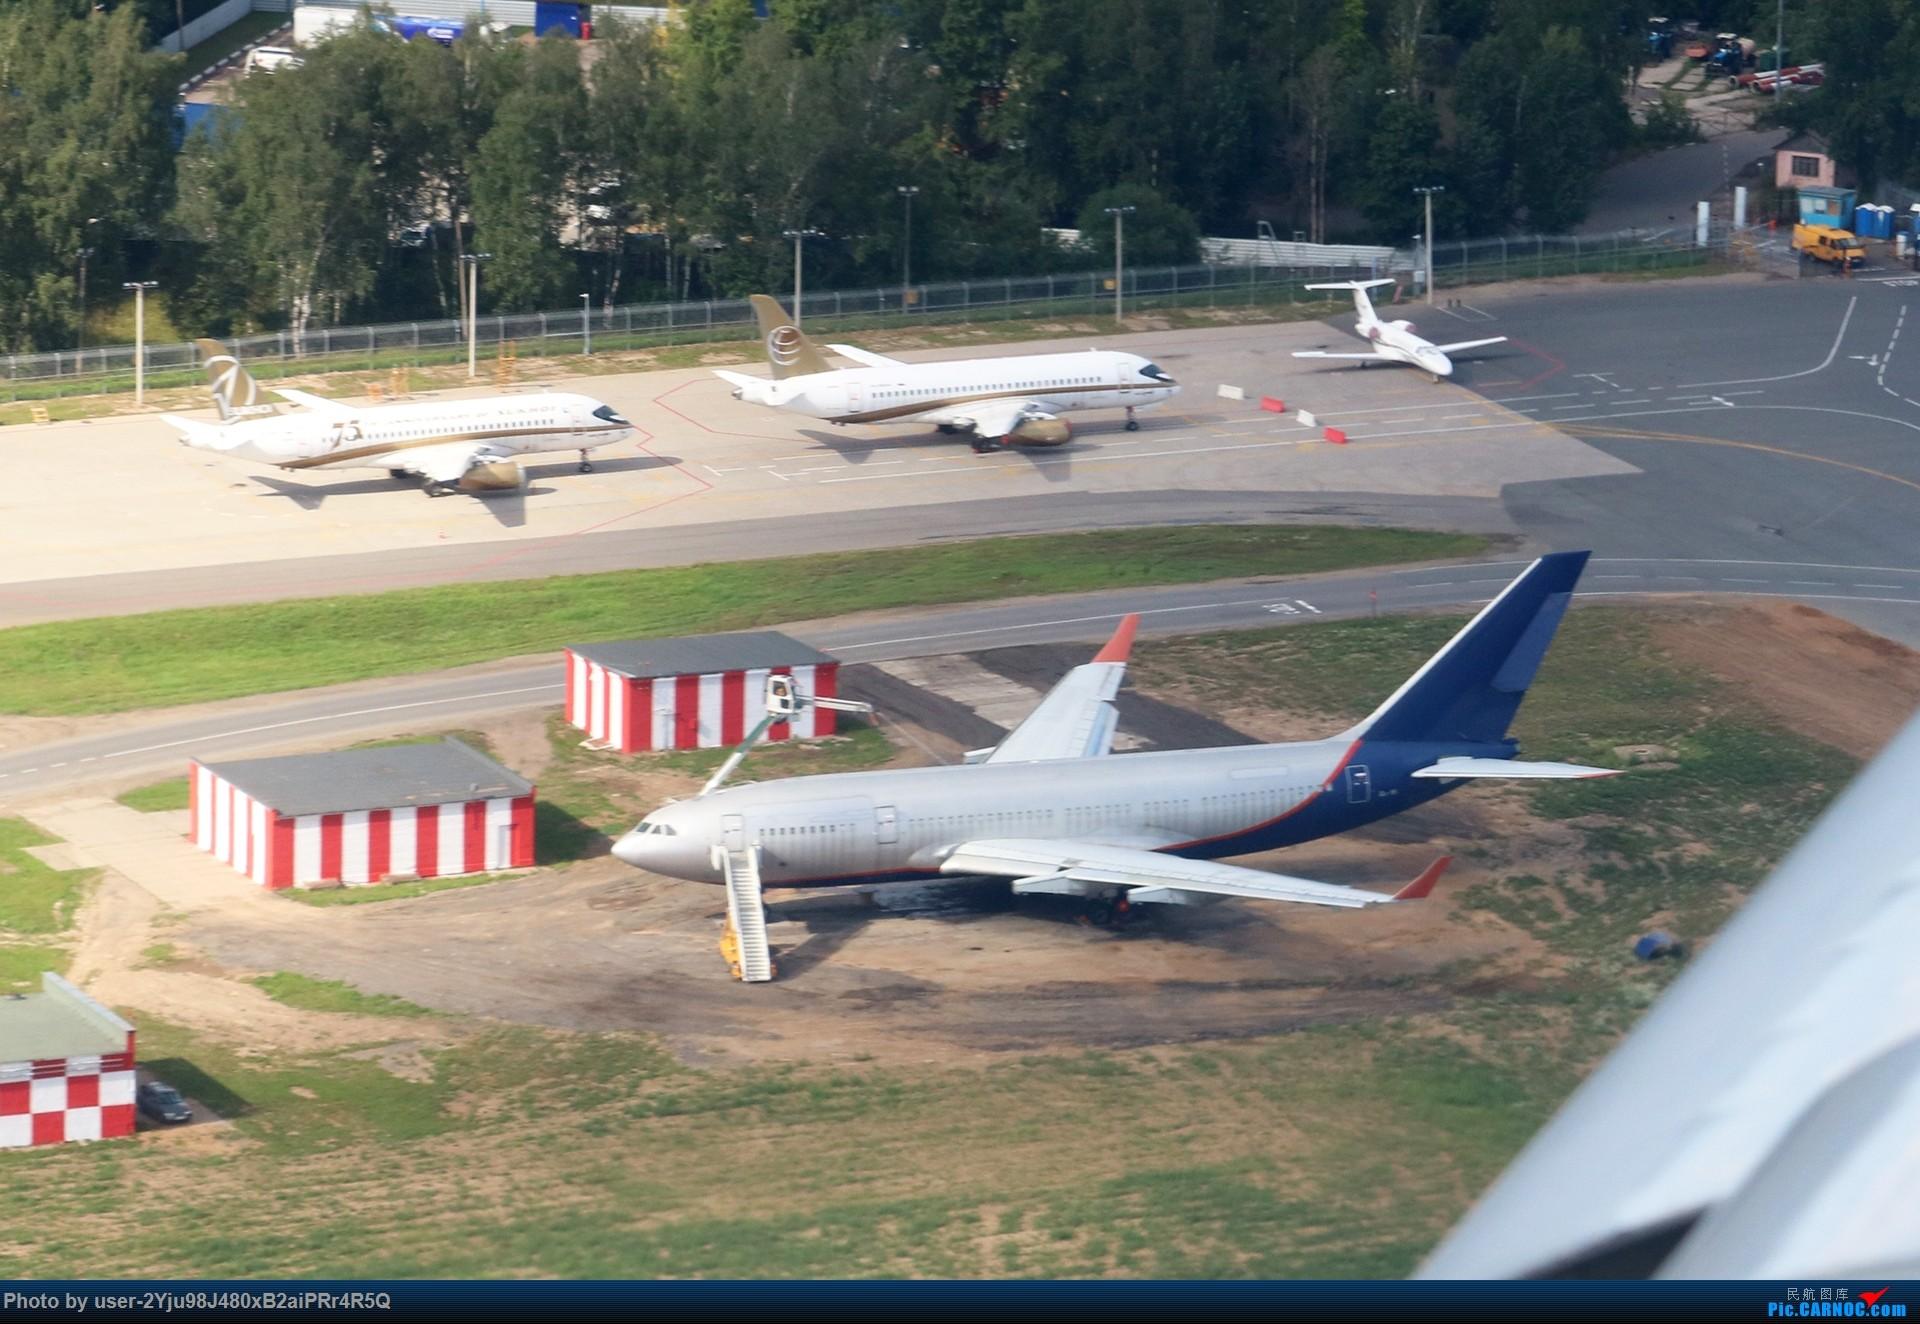 Re:[原创]LIULIU|一天两种机型三个国家四段航线五座城市的回家之路|西伯利亚上空的星光 ILYUSHIN IL-96 NONE. 俄罗斯谢诺梅杰沃机场